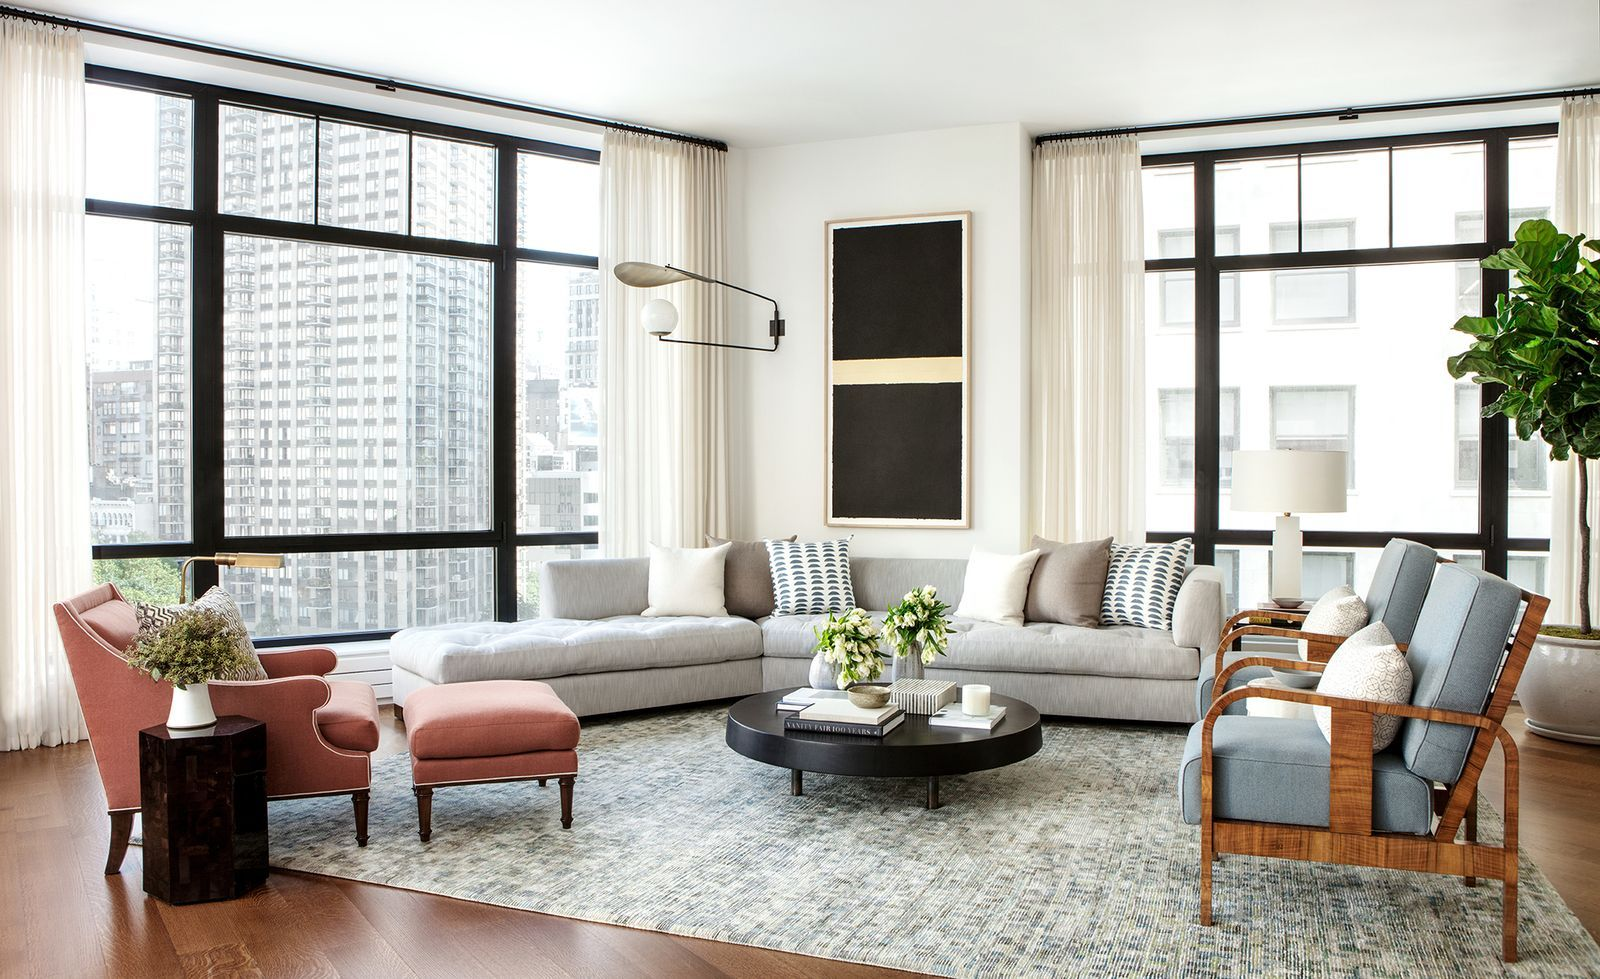 46+ Living room arrangement ideas info